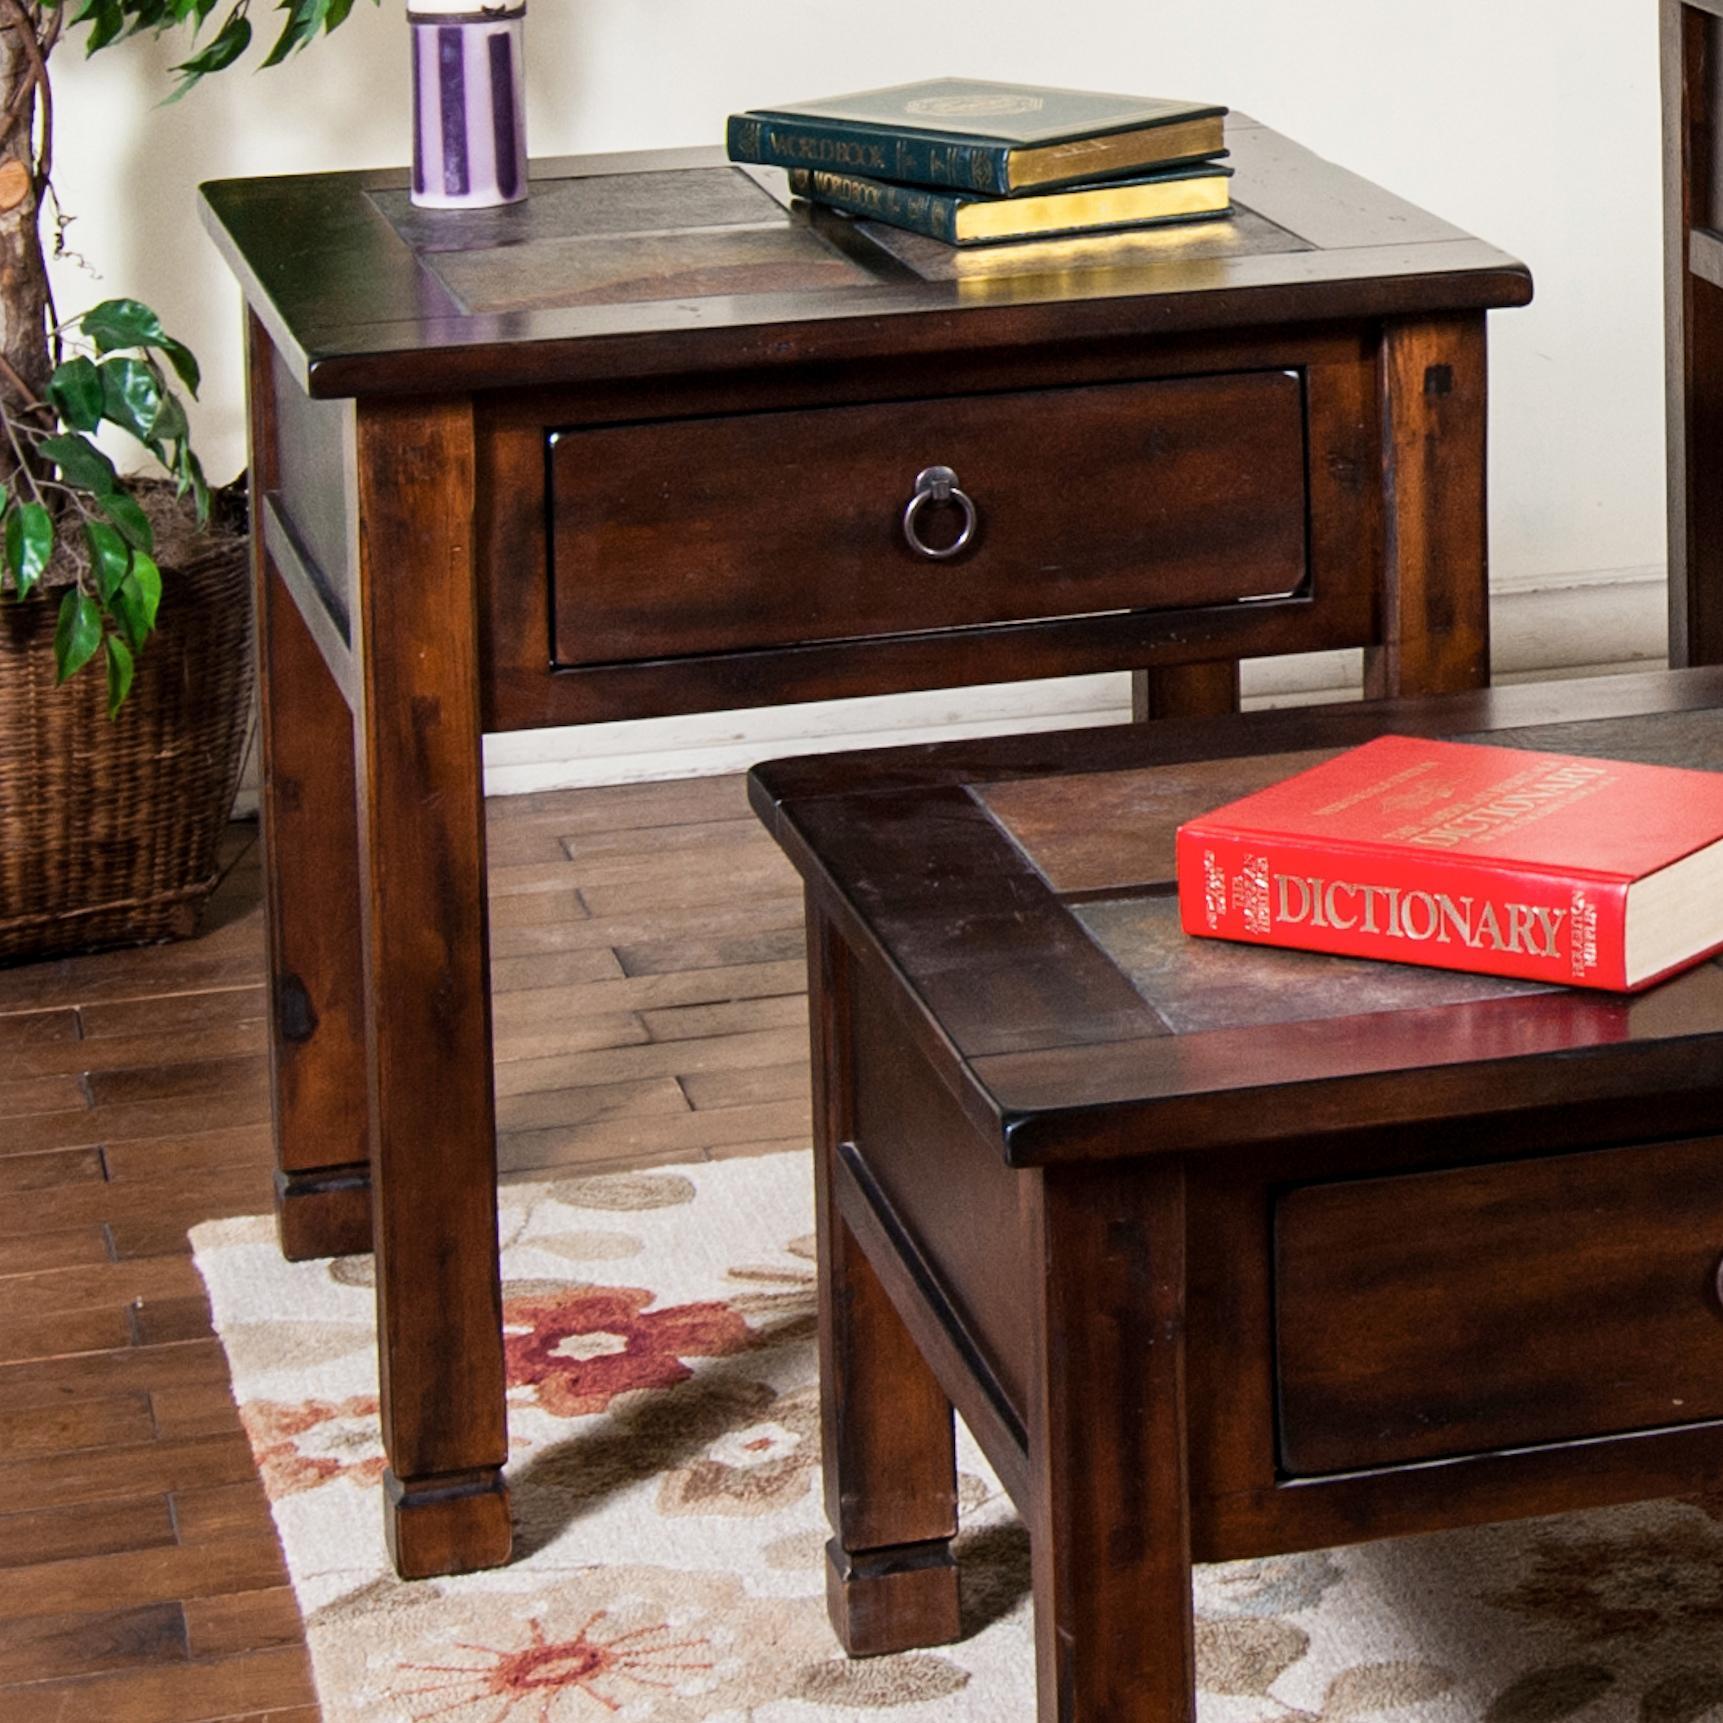 Sunny Designs Santa Fe End Table w/ Slate Top - Item Number: 3144DC-2